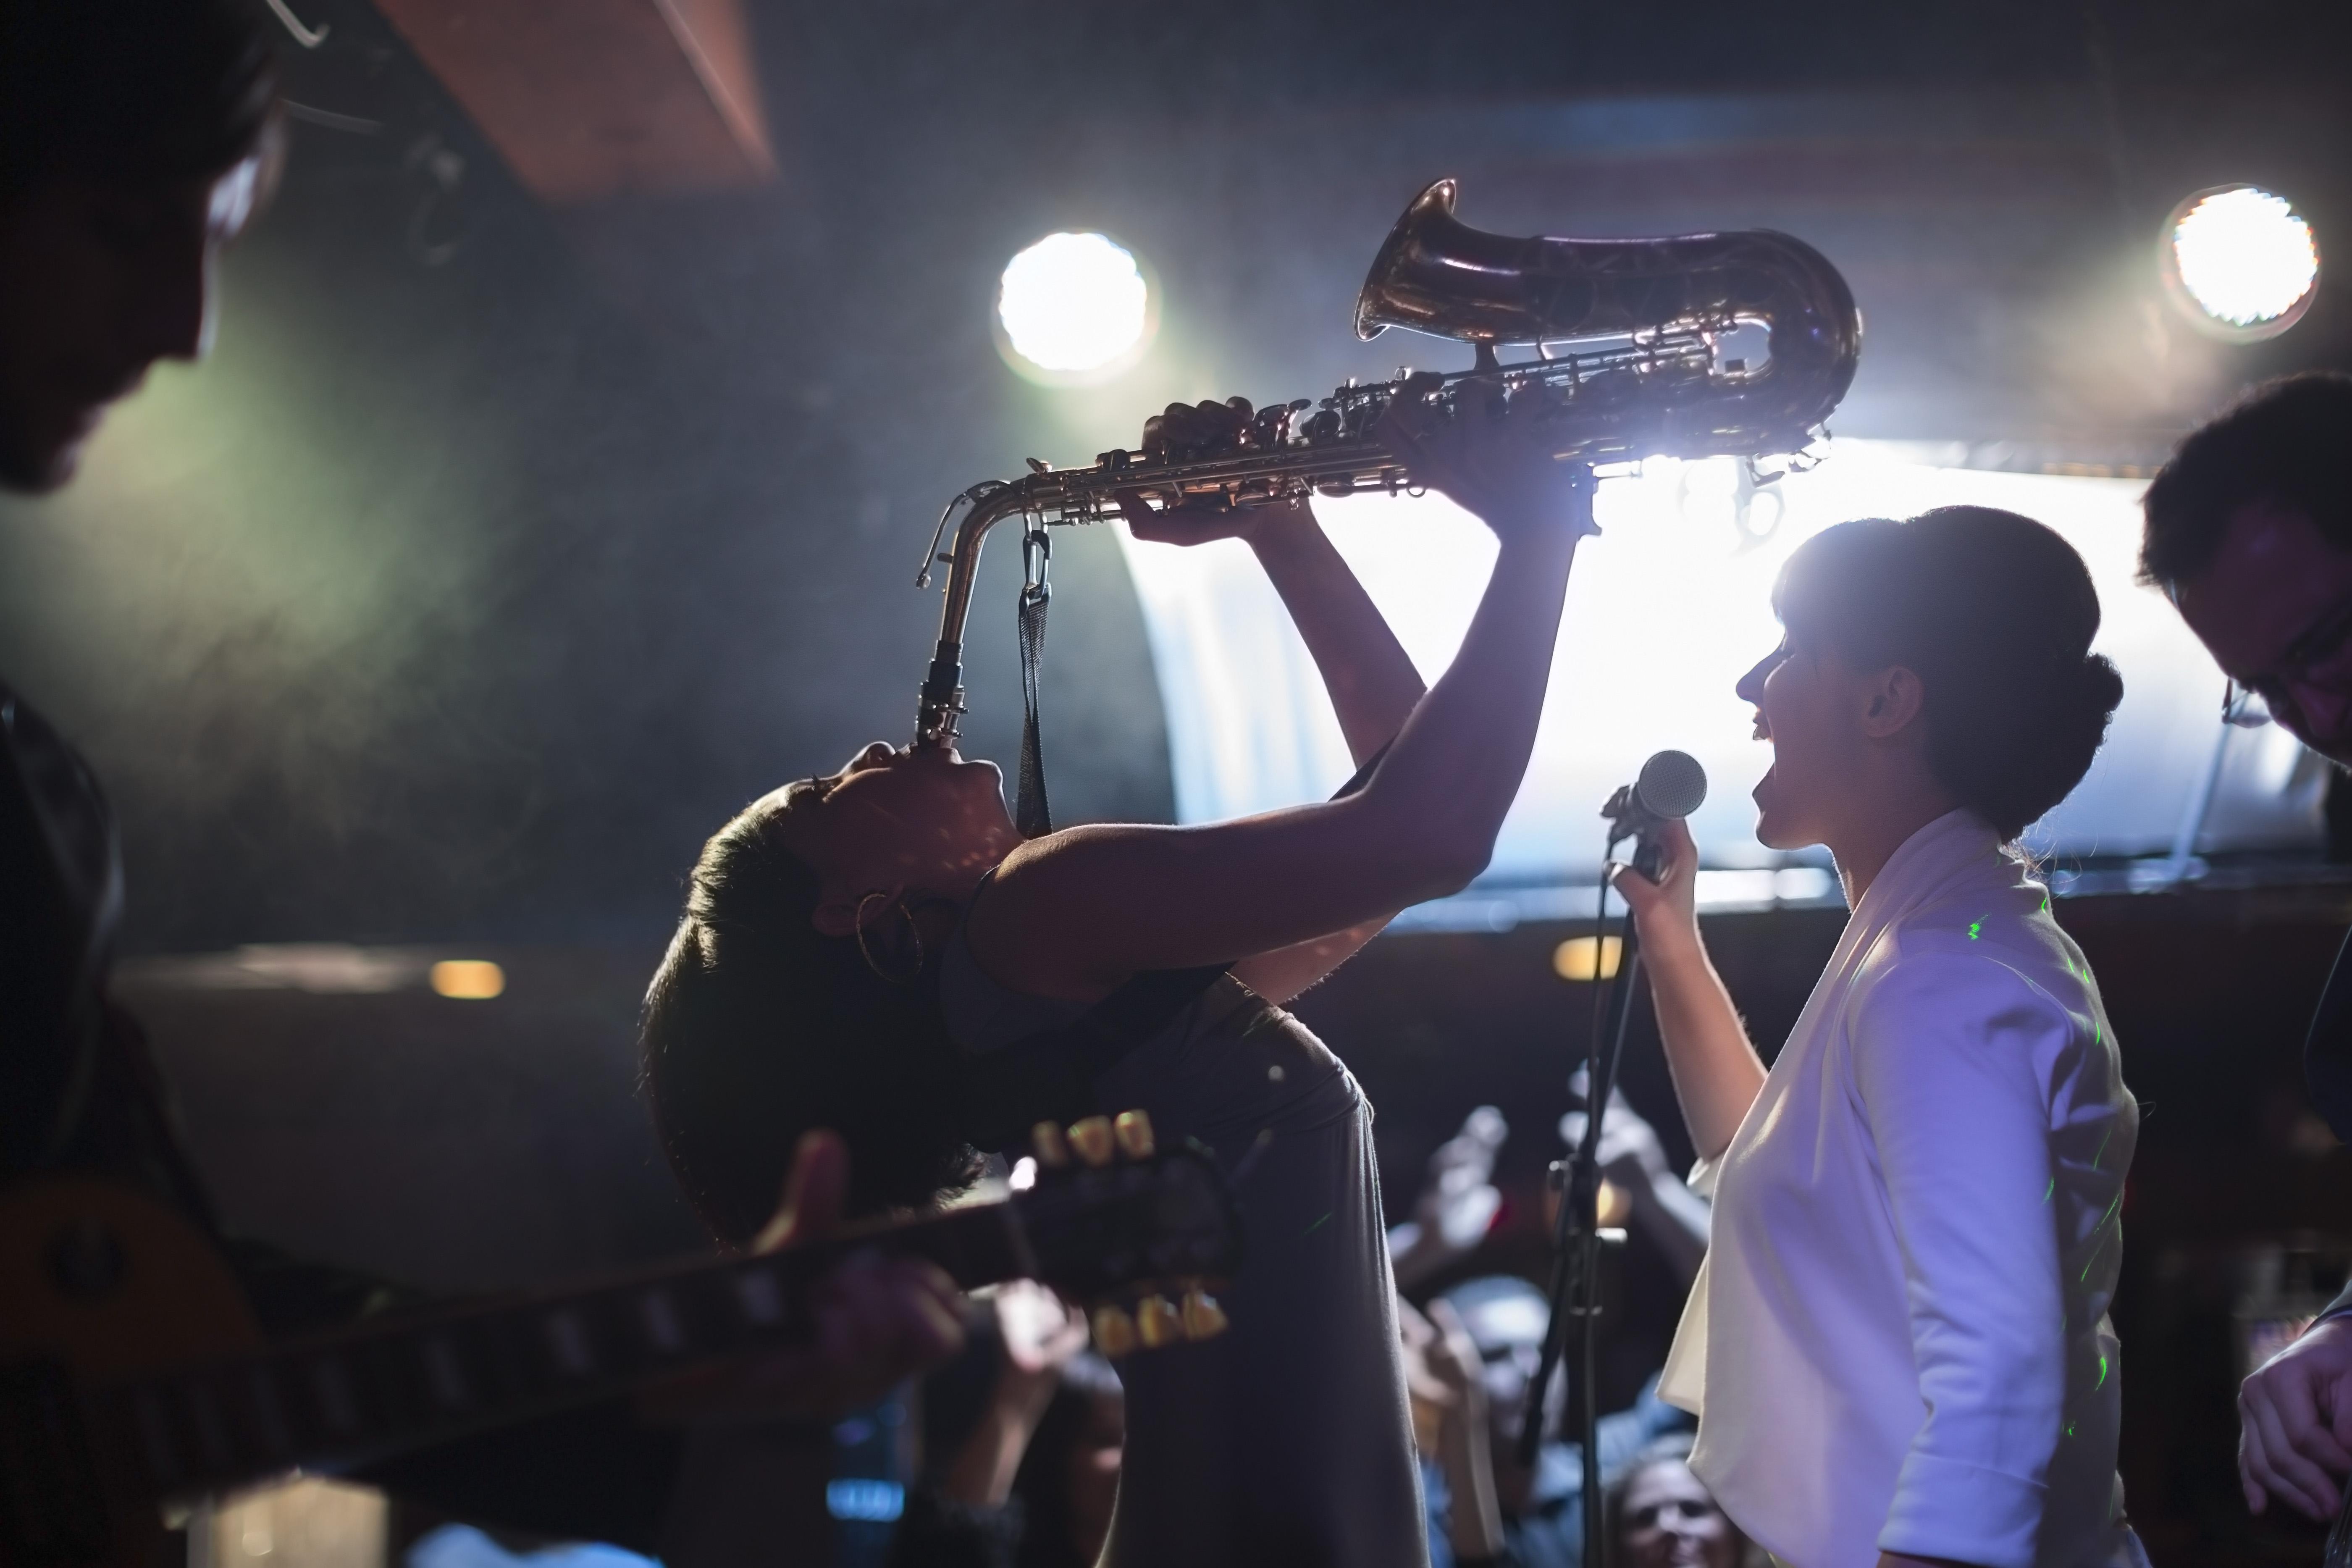 Saxophon - Saxophonistin mit DJ